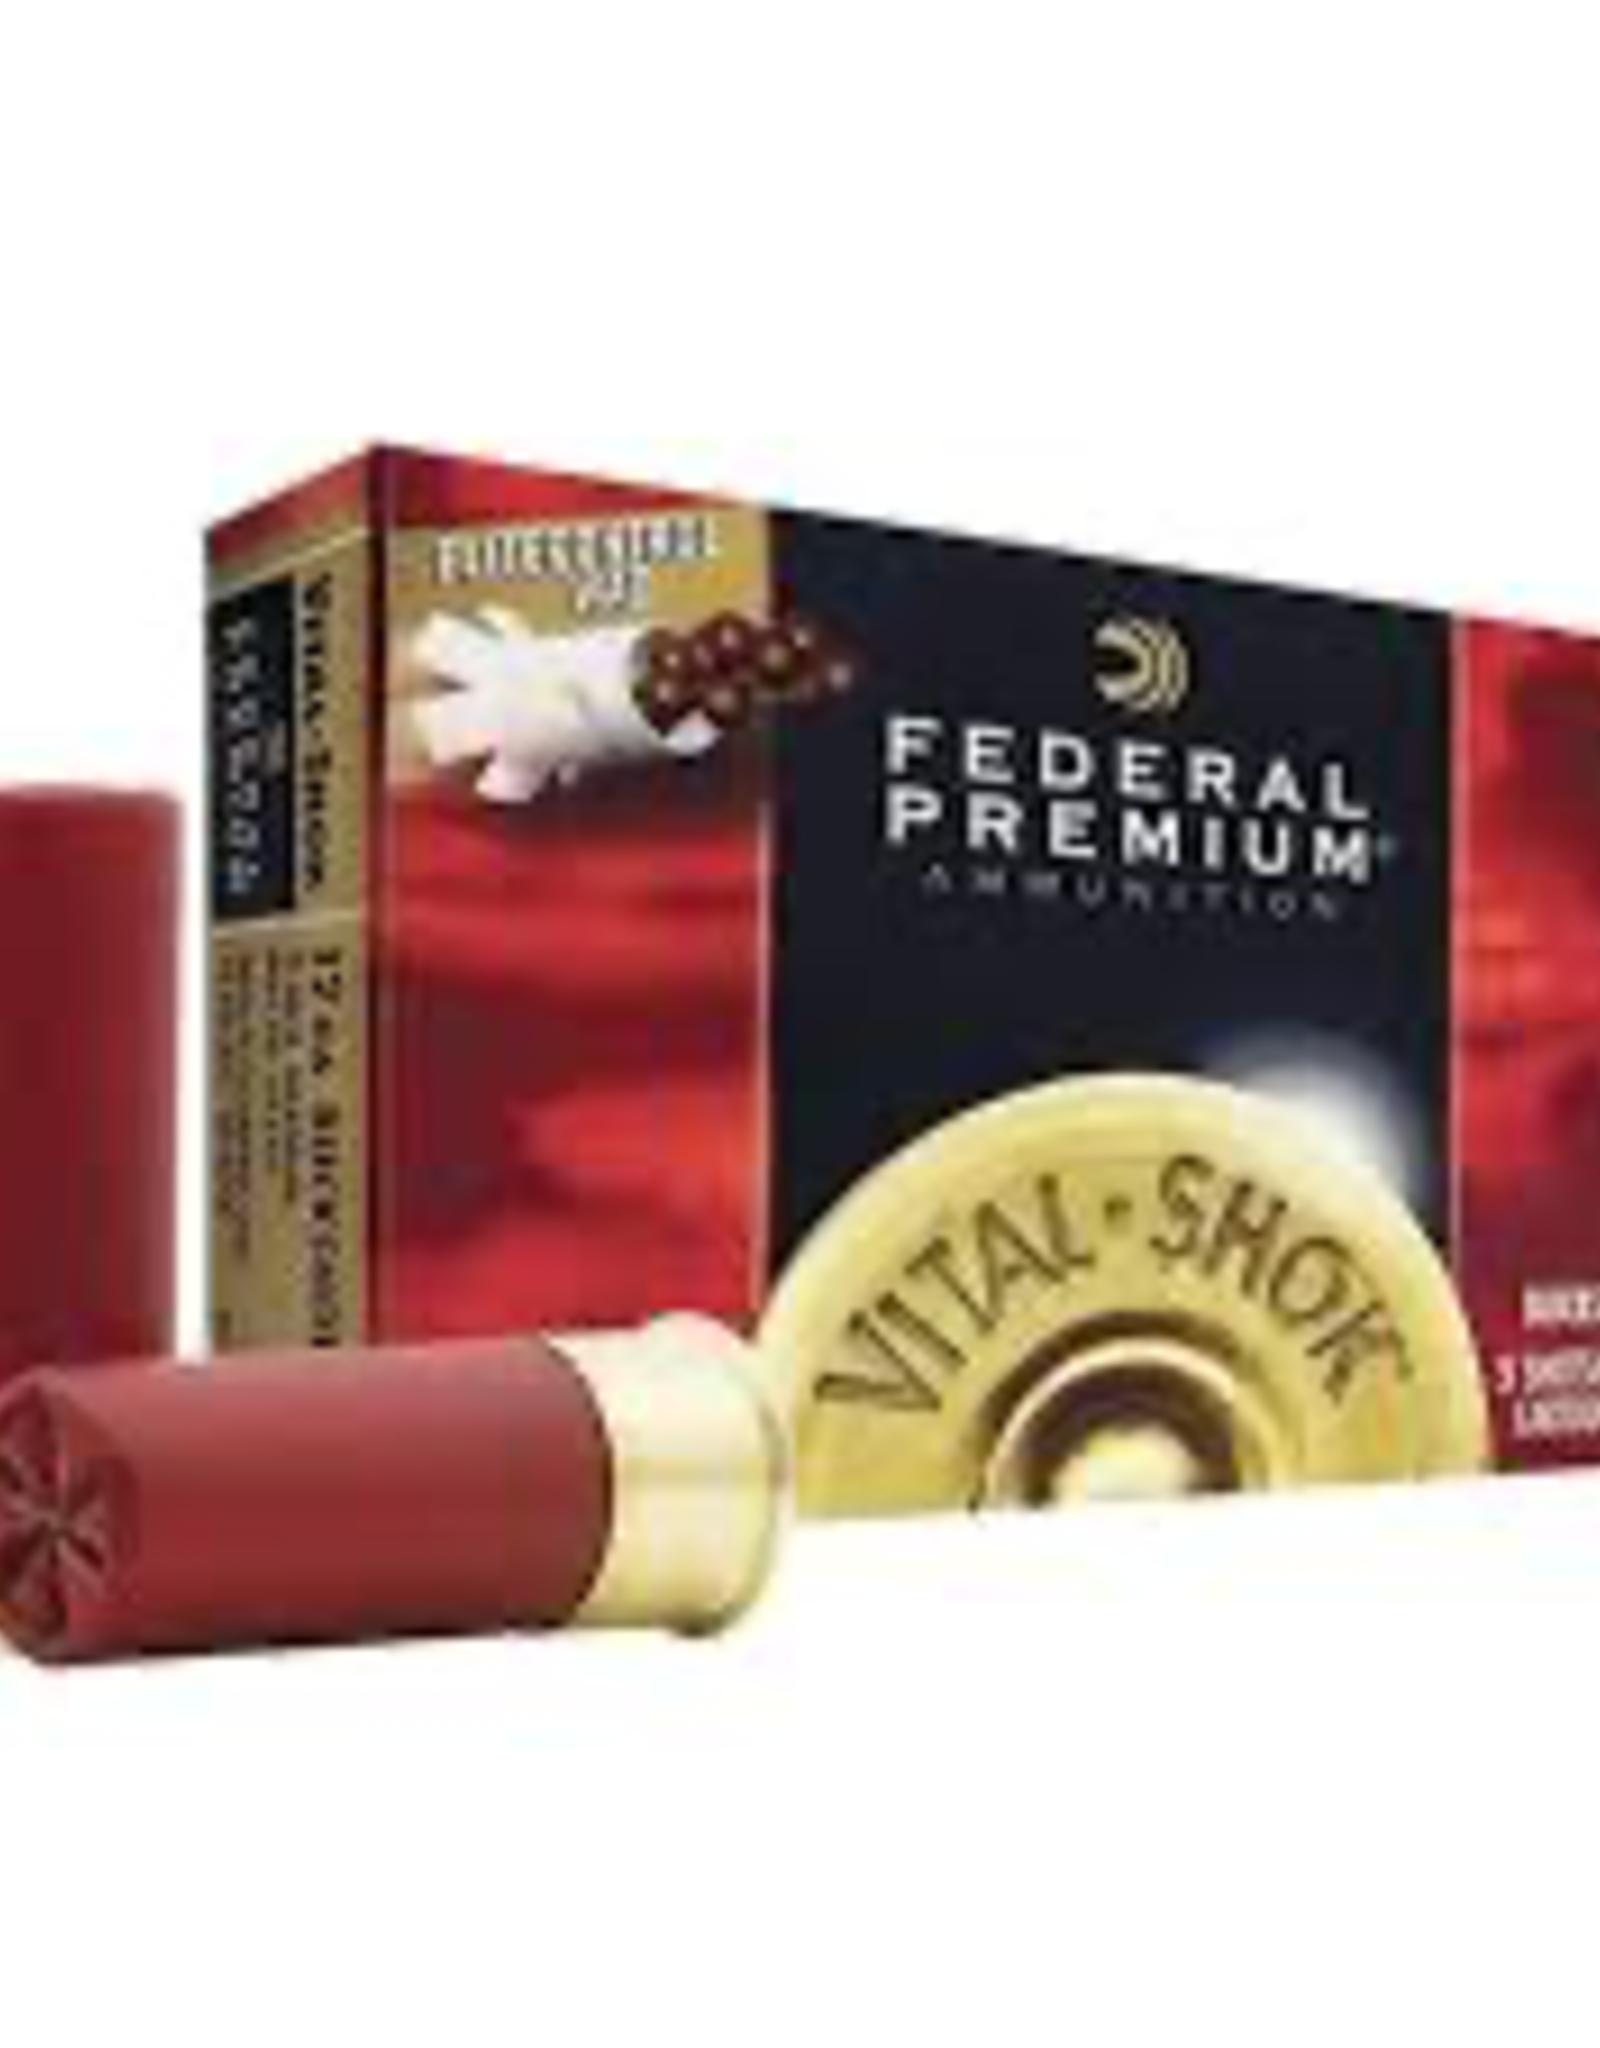 Federal 12 GA 2 3/4 00BUCK